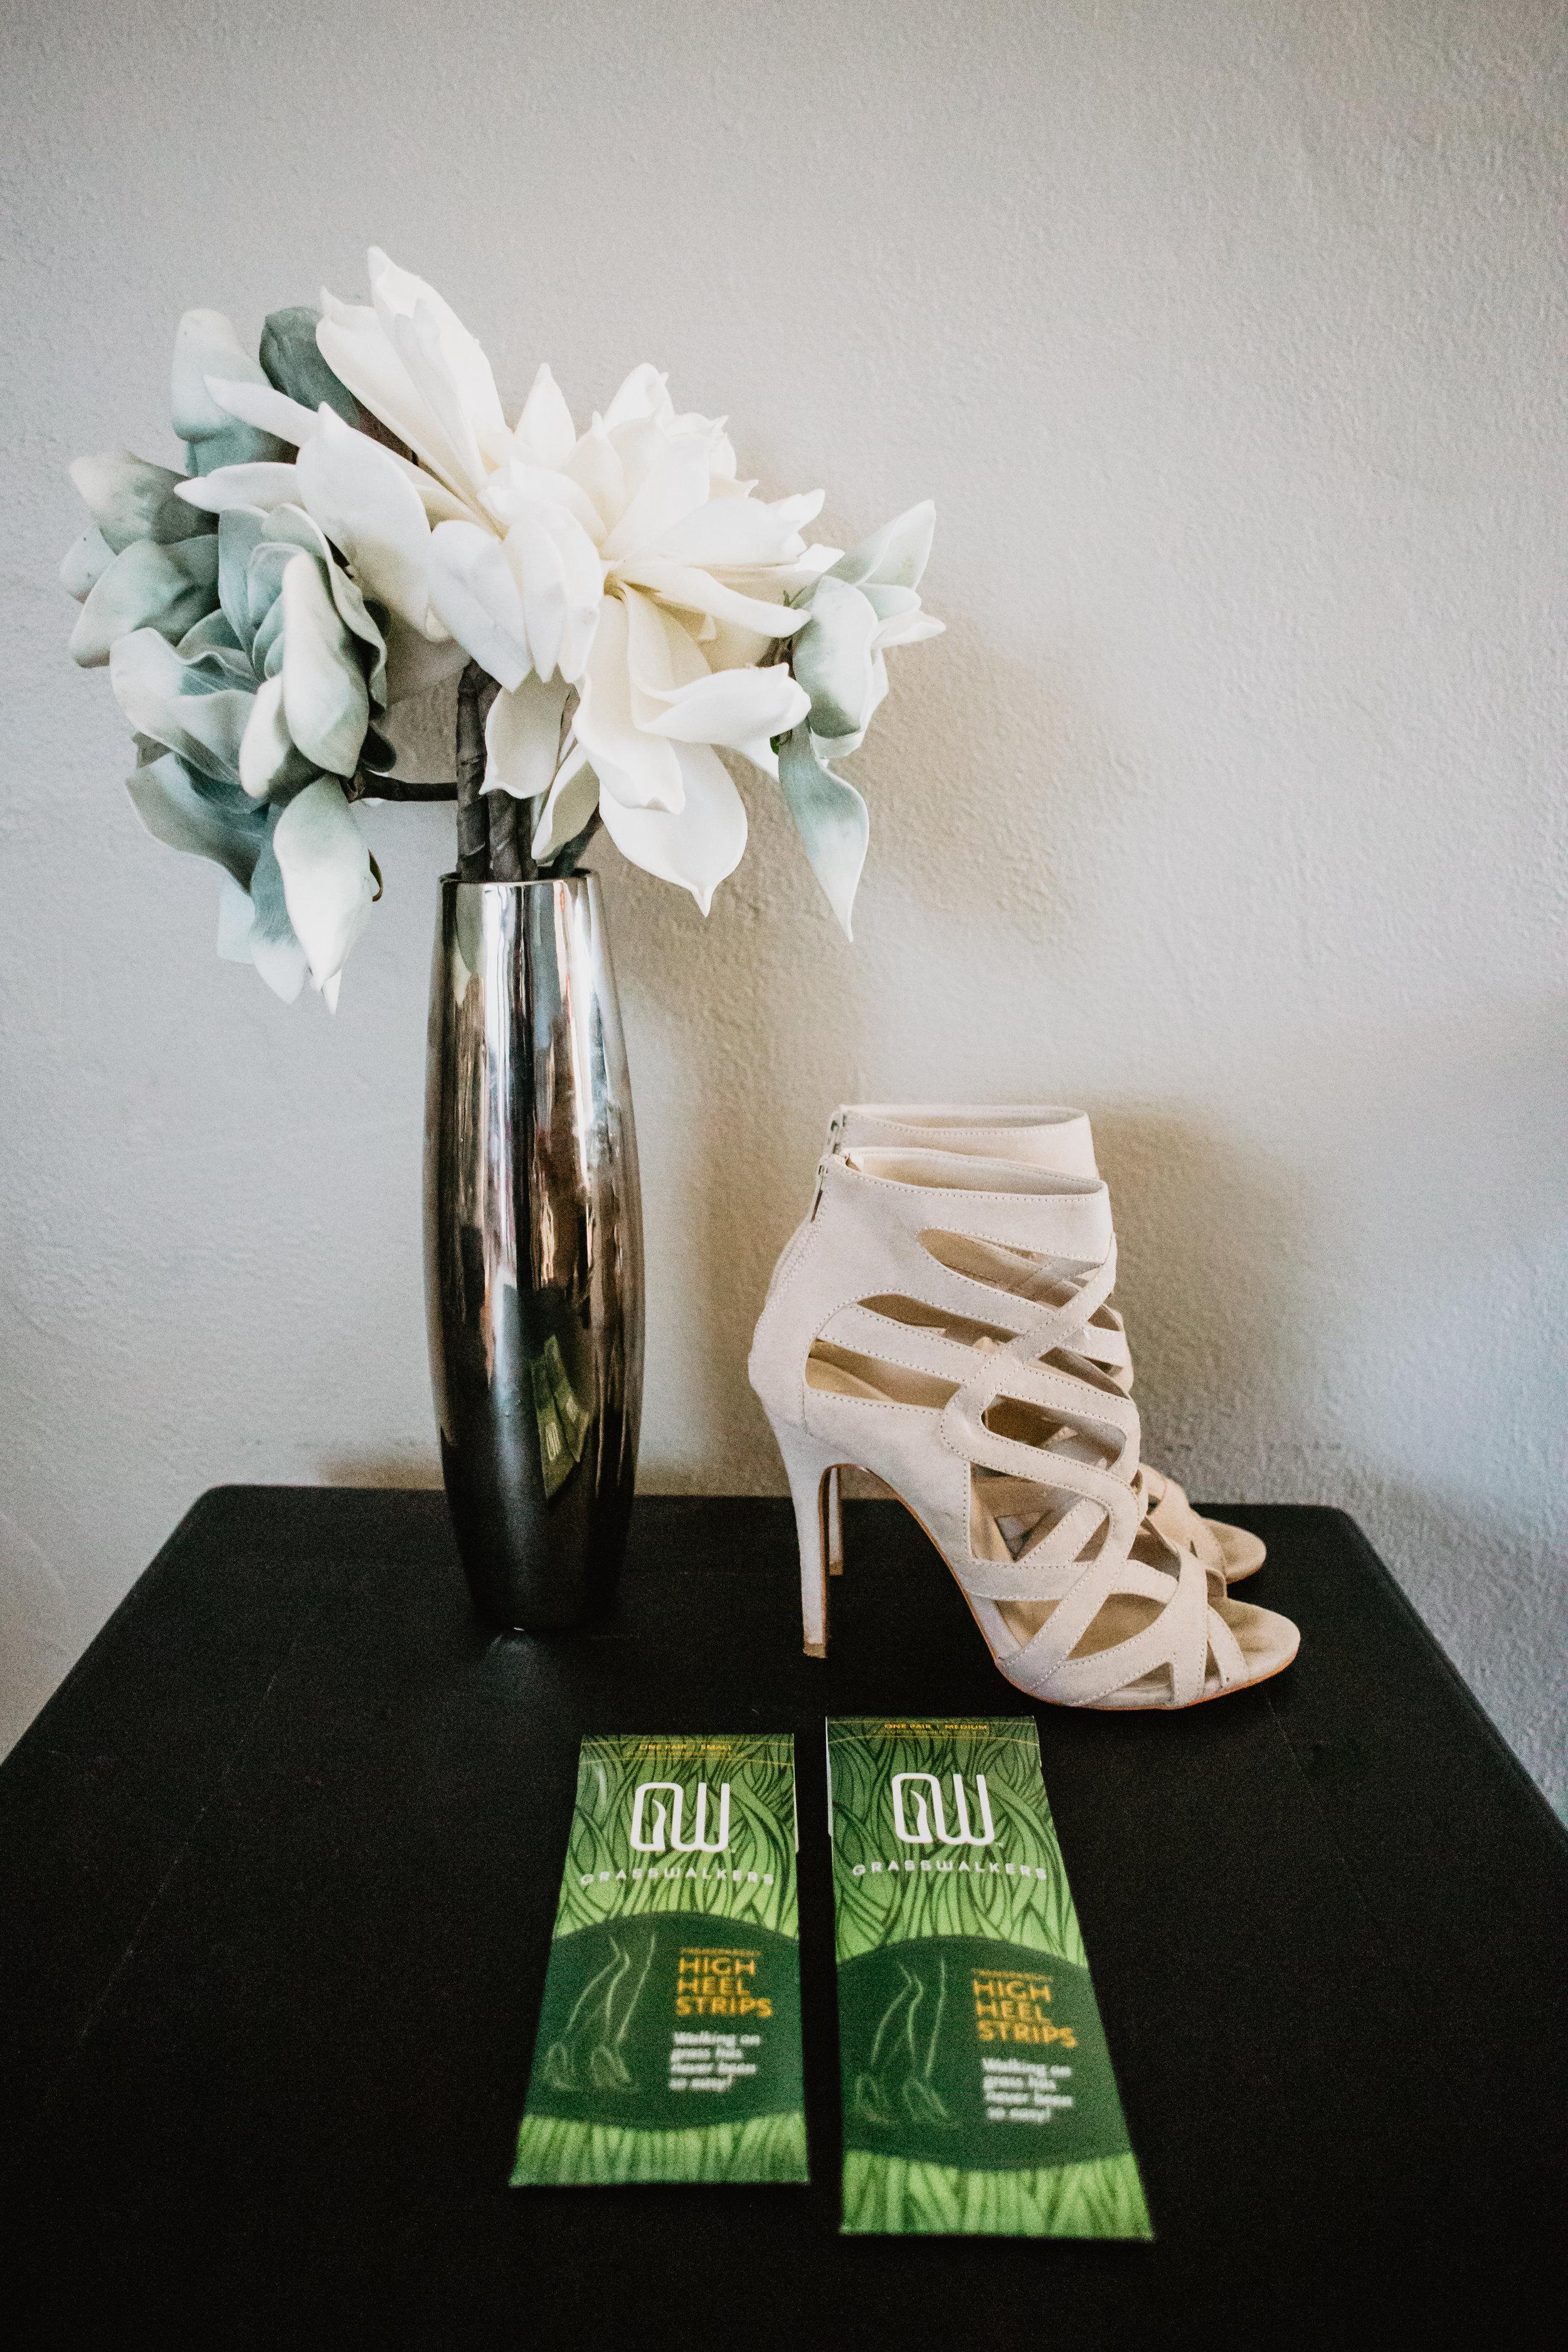 Stiletto Heel Grass Protectors - Make it Easier to Walk in Grass with Heels - Grasswalkers -- Wedding Blog - The Overwhelmed Bride